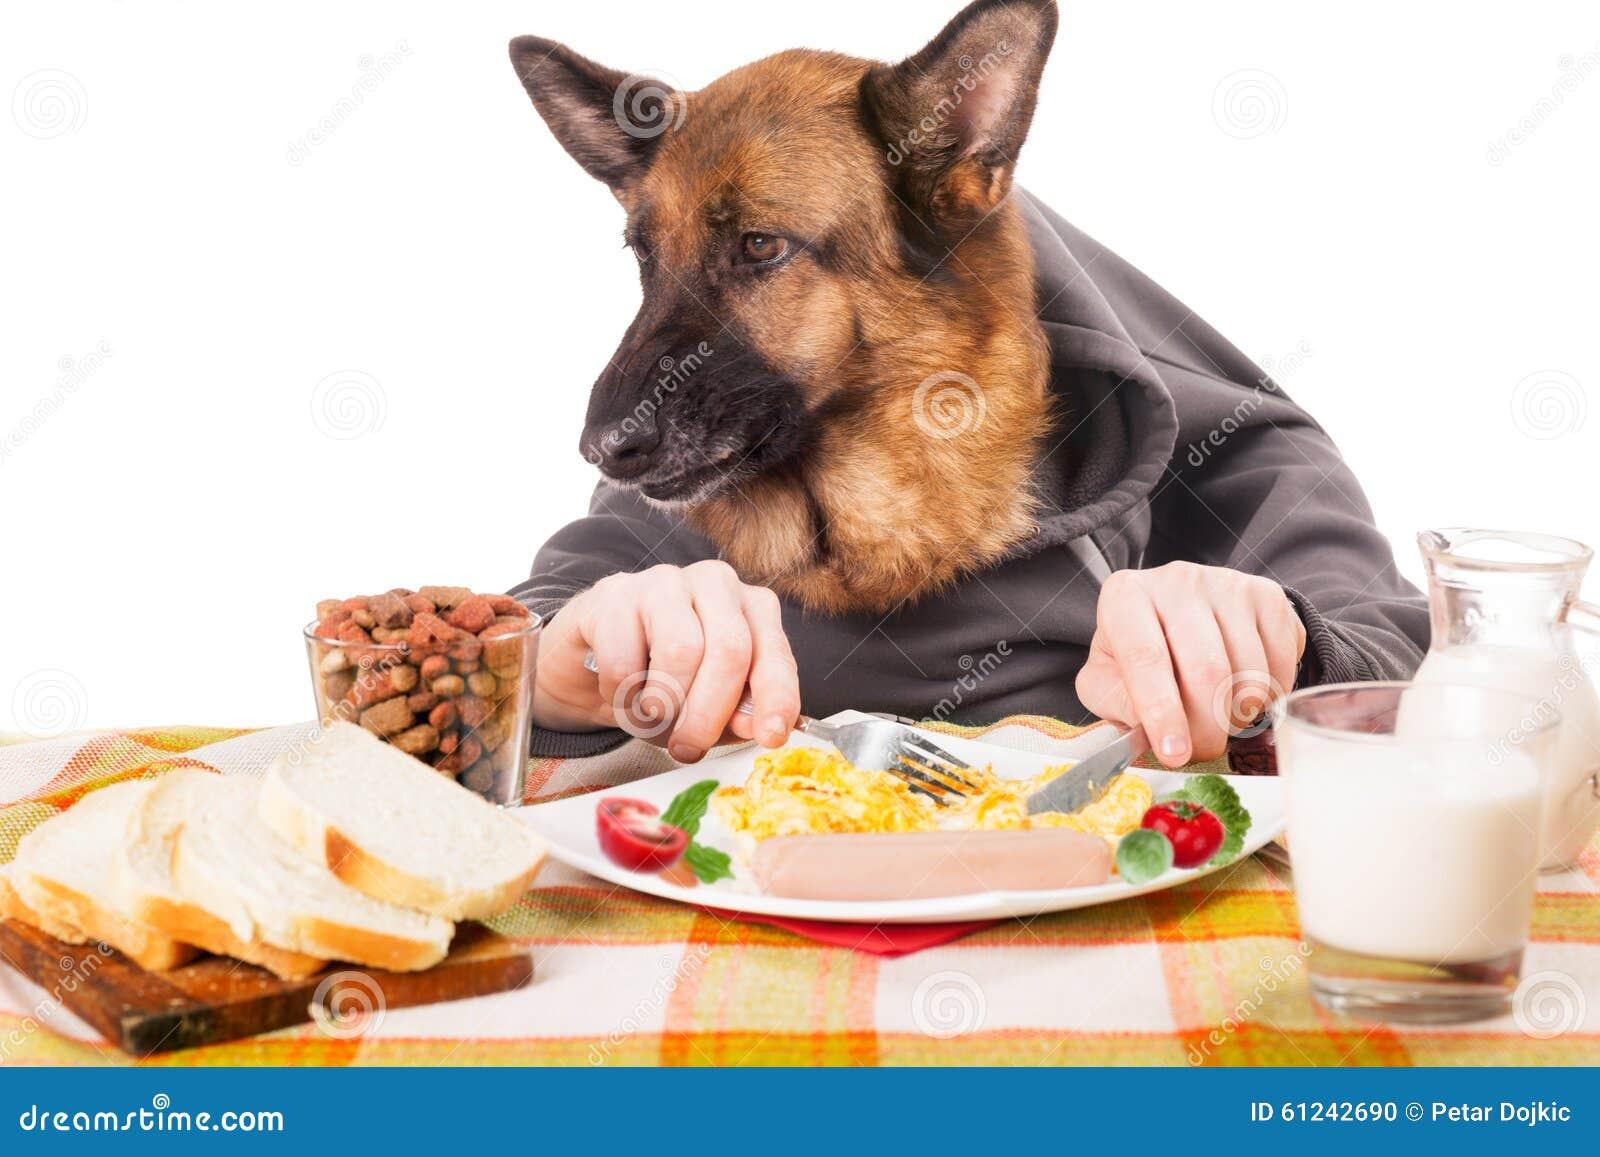 Dog Eating Food Human Hands